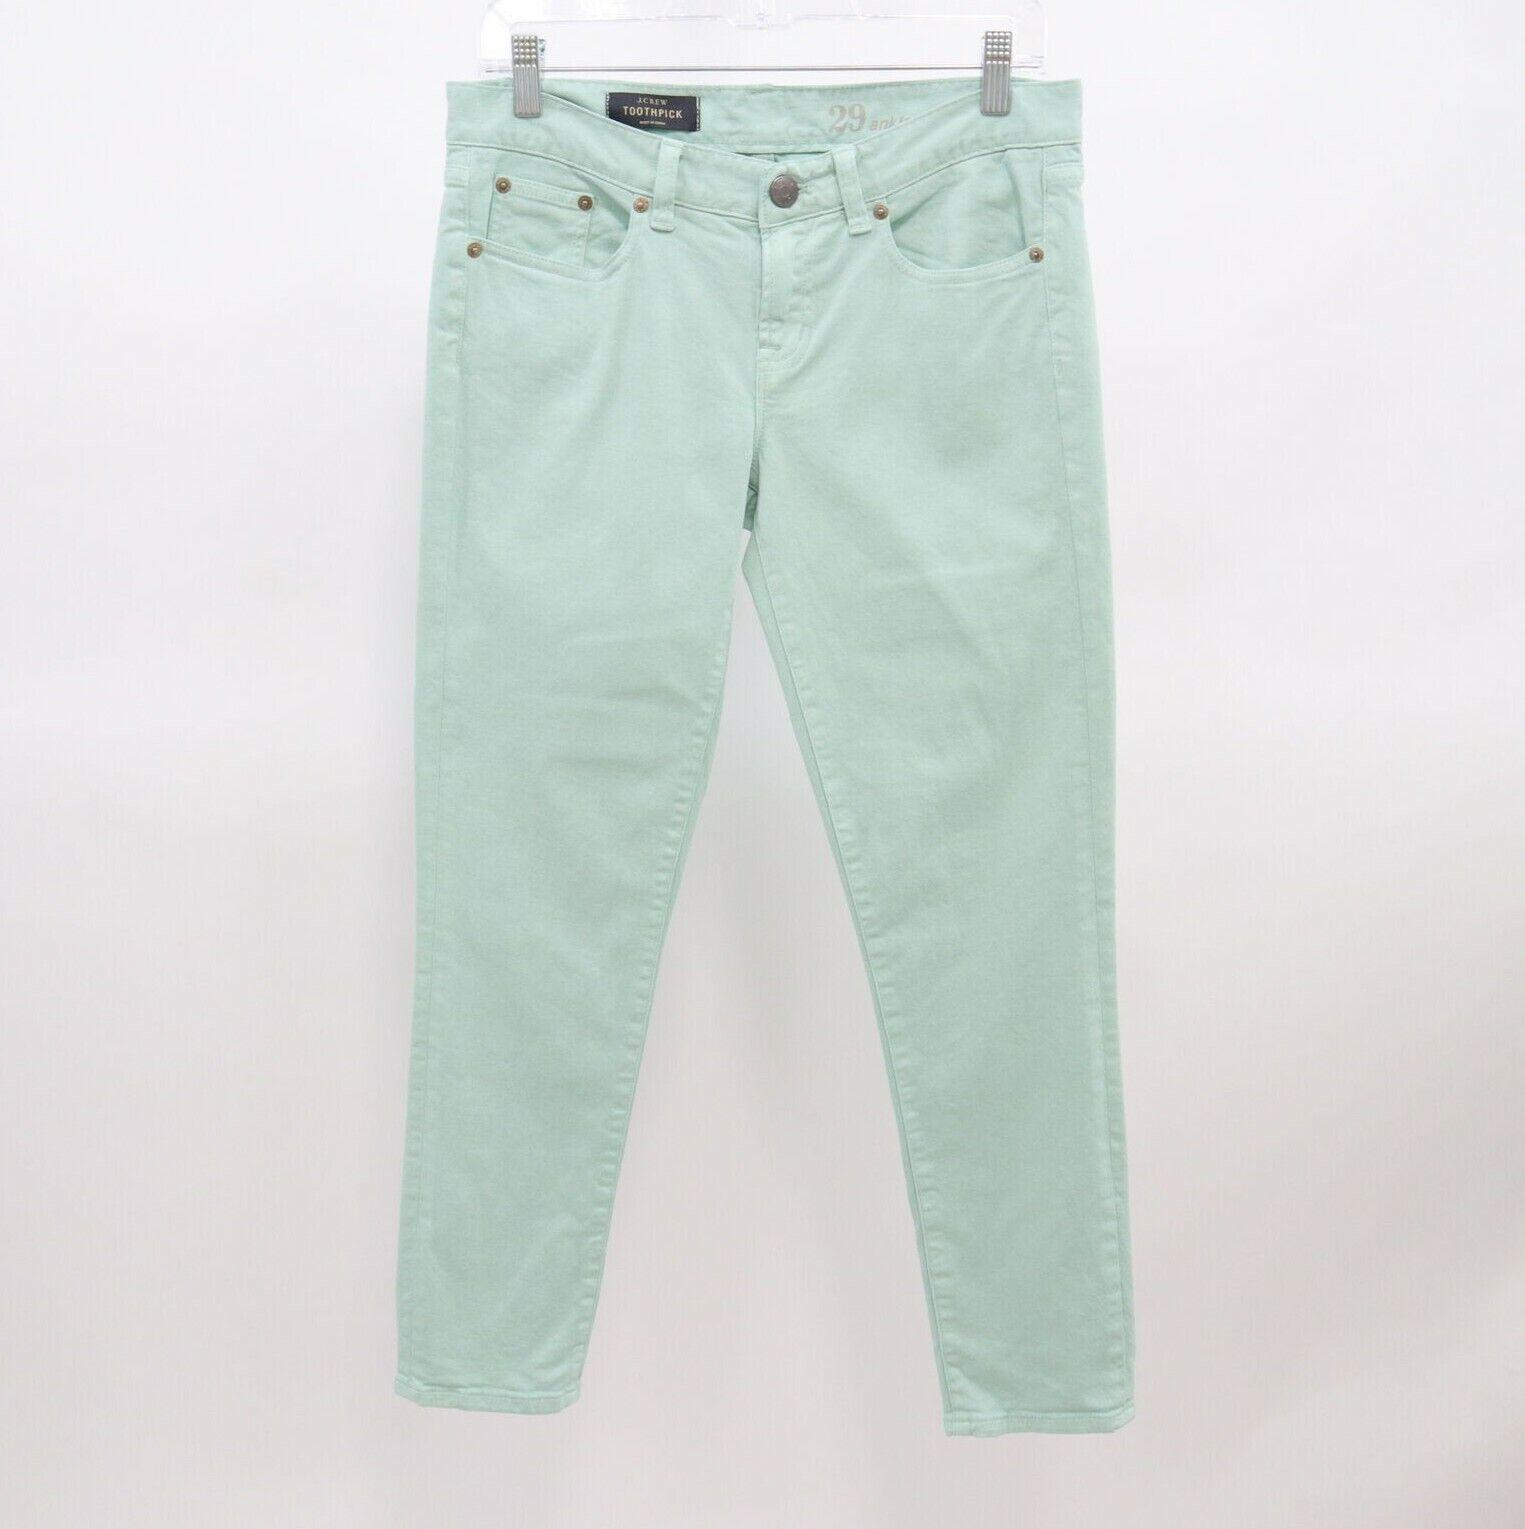 J.CREW Skinny Jeans Toothpick Ankle Womens Mint Gr